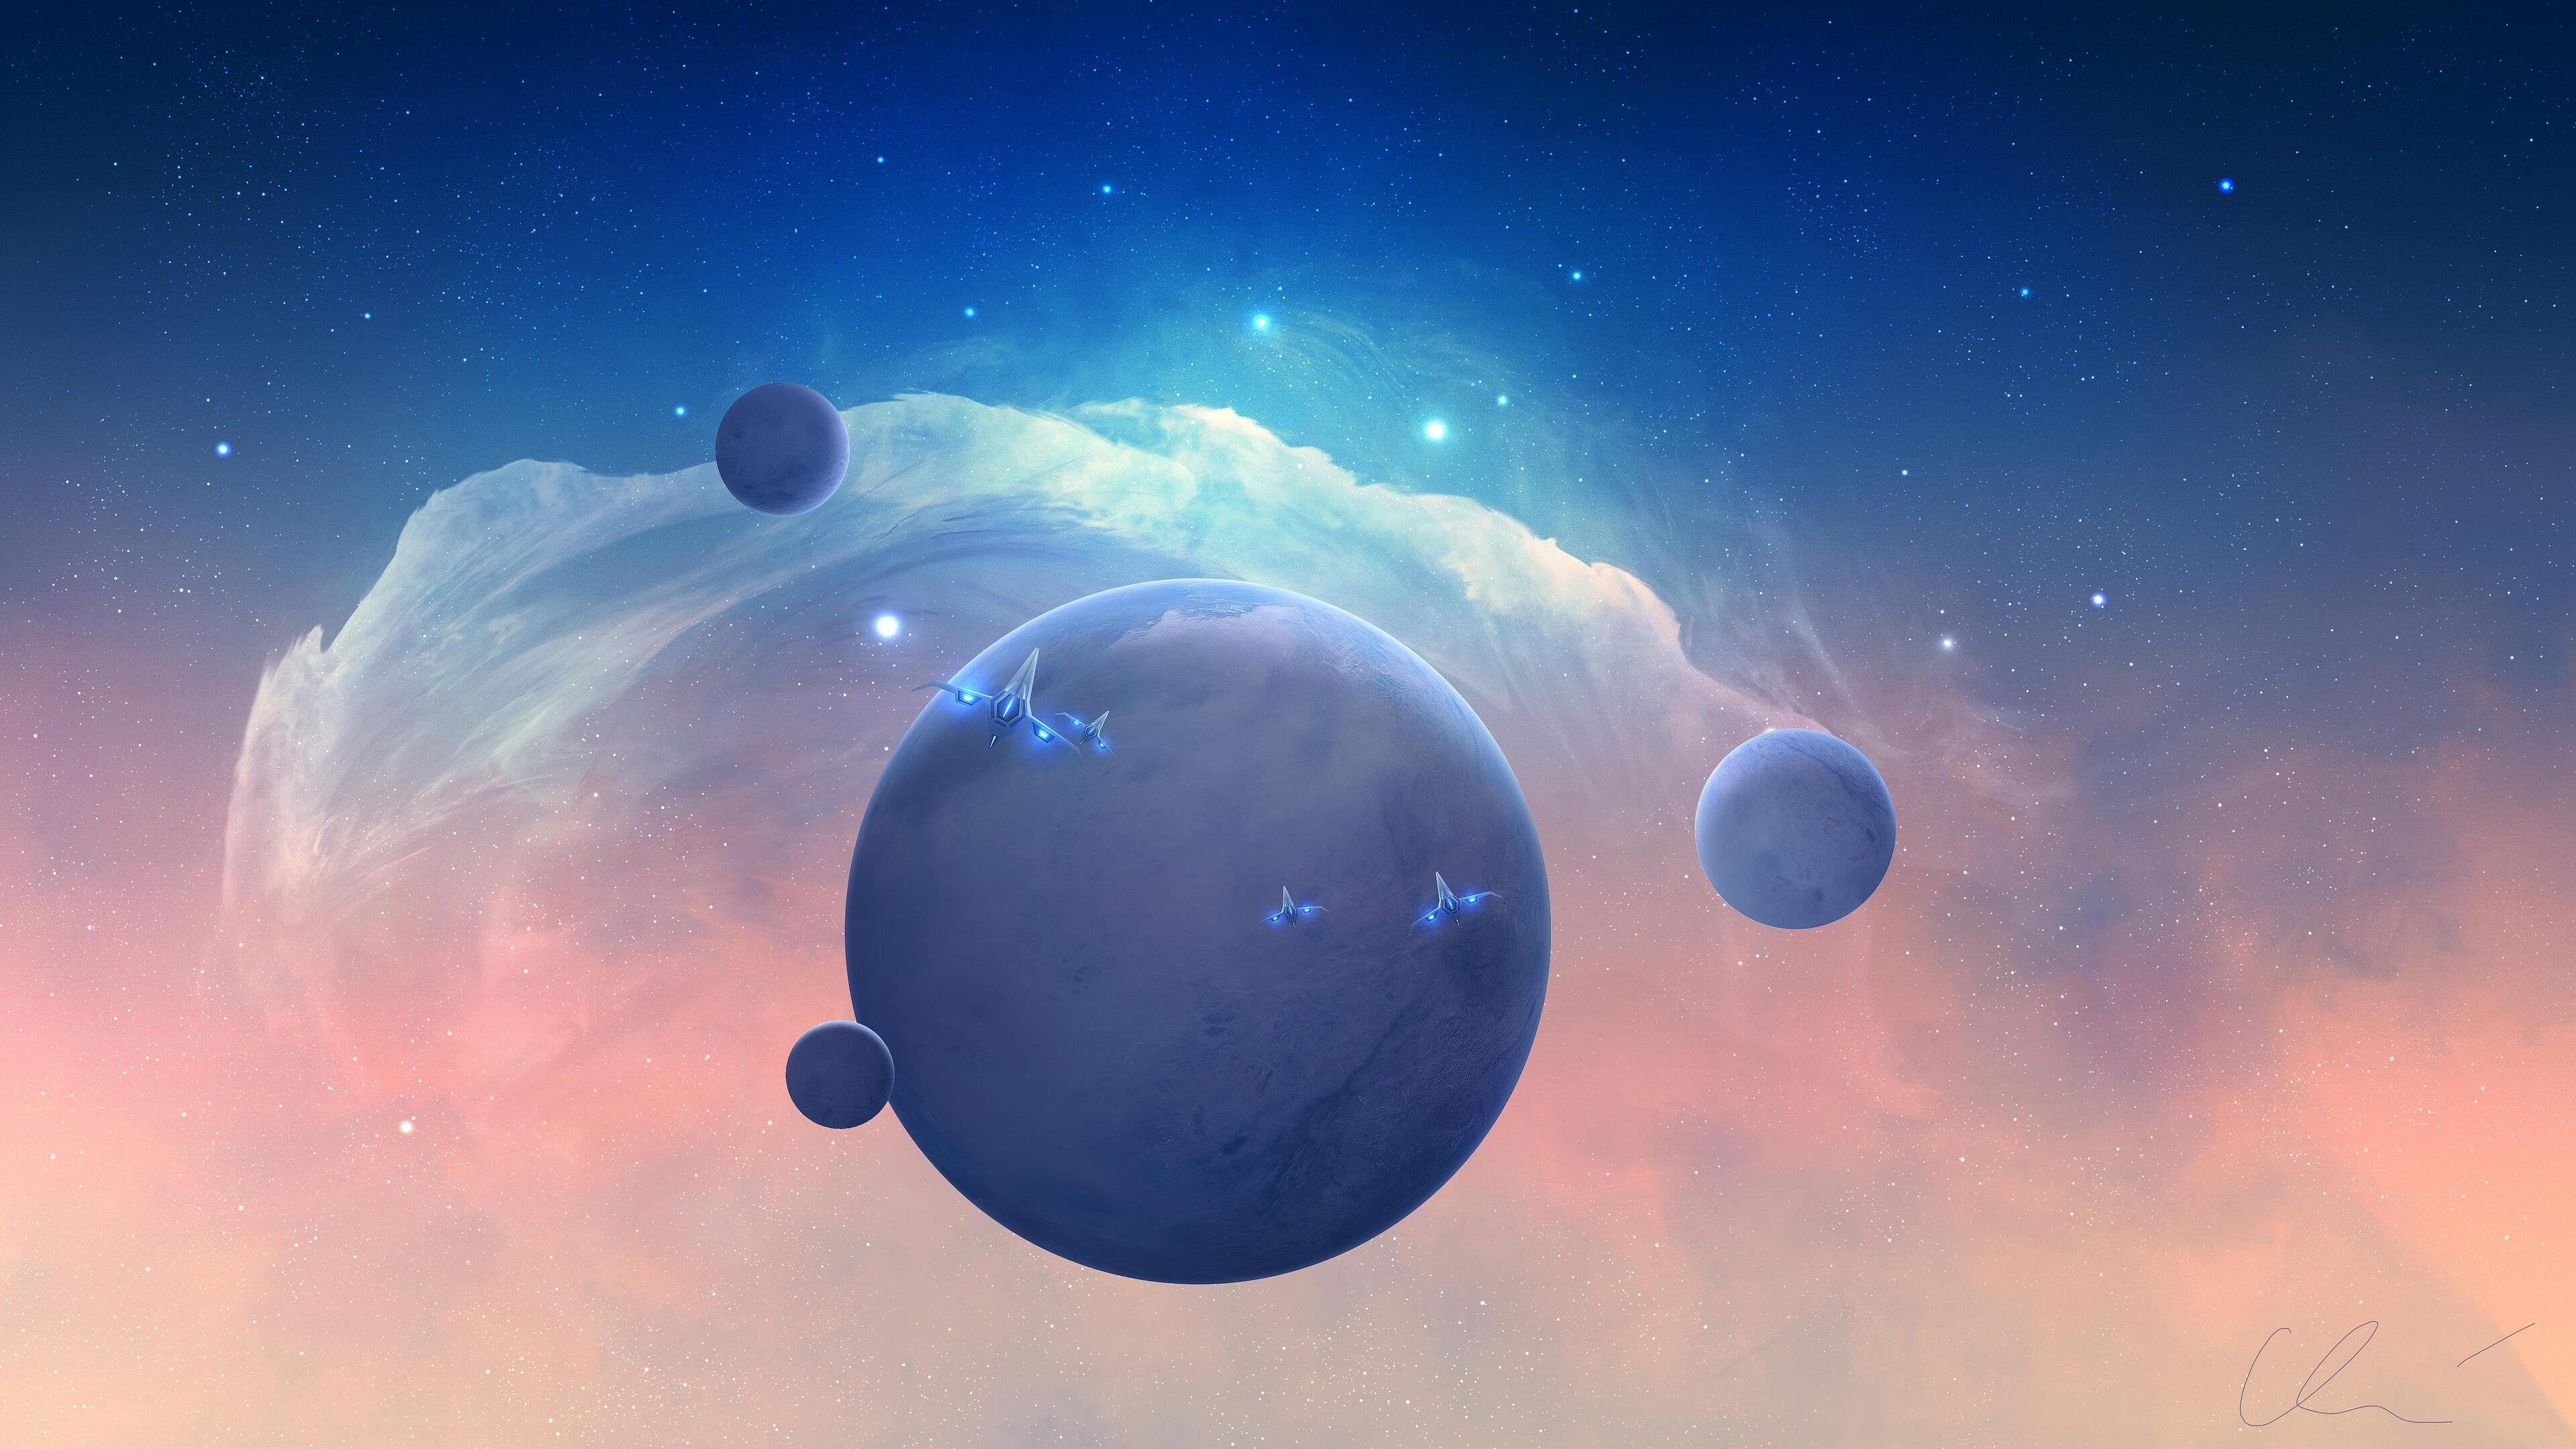 science-fiction-planet-5k-yg.jpg